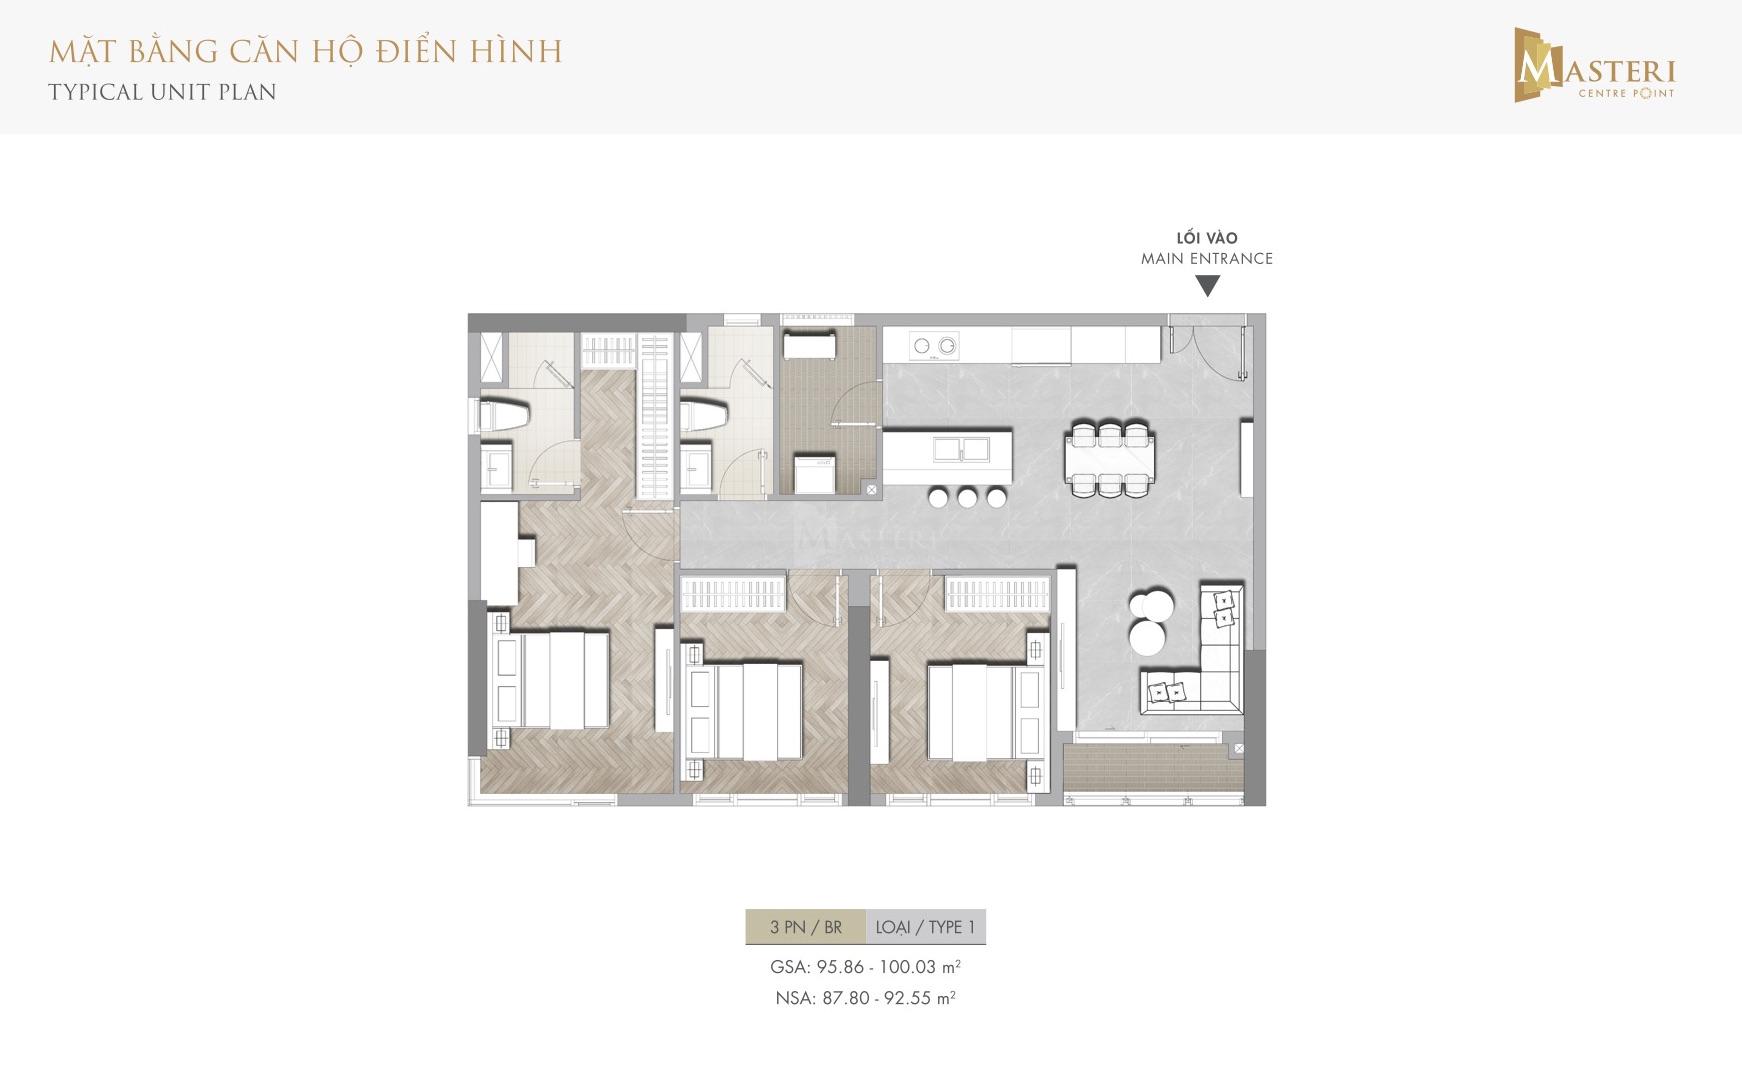 Layout mặt bằng thiết kế căn hộ Masteri Centre Point